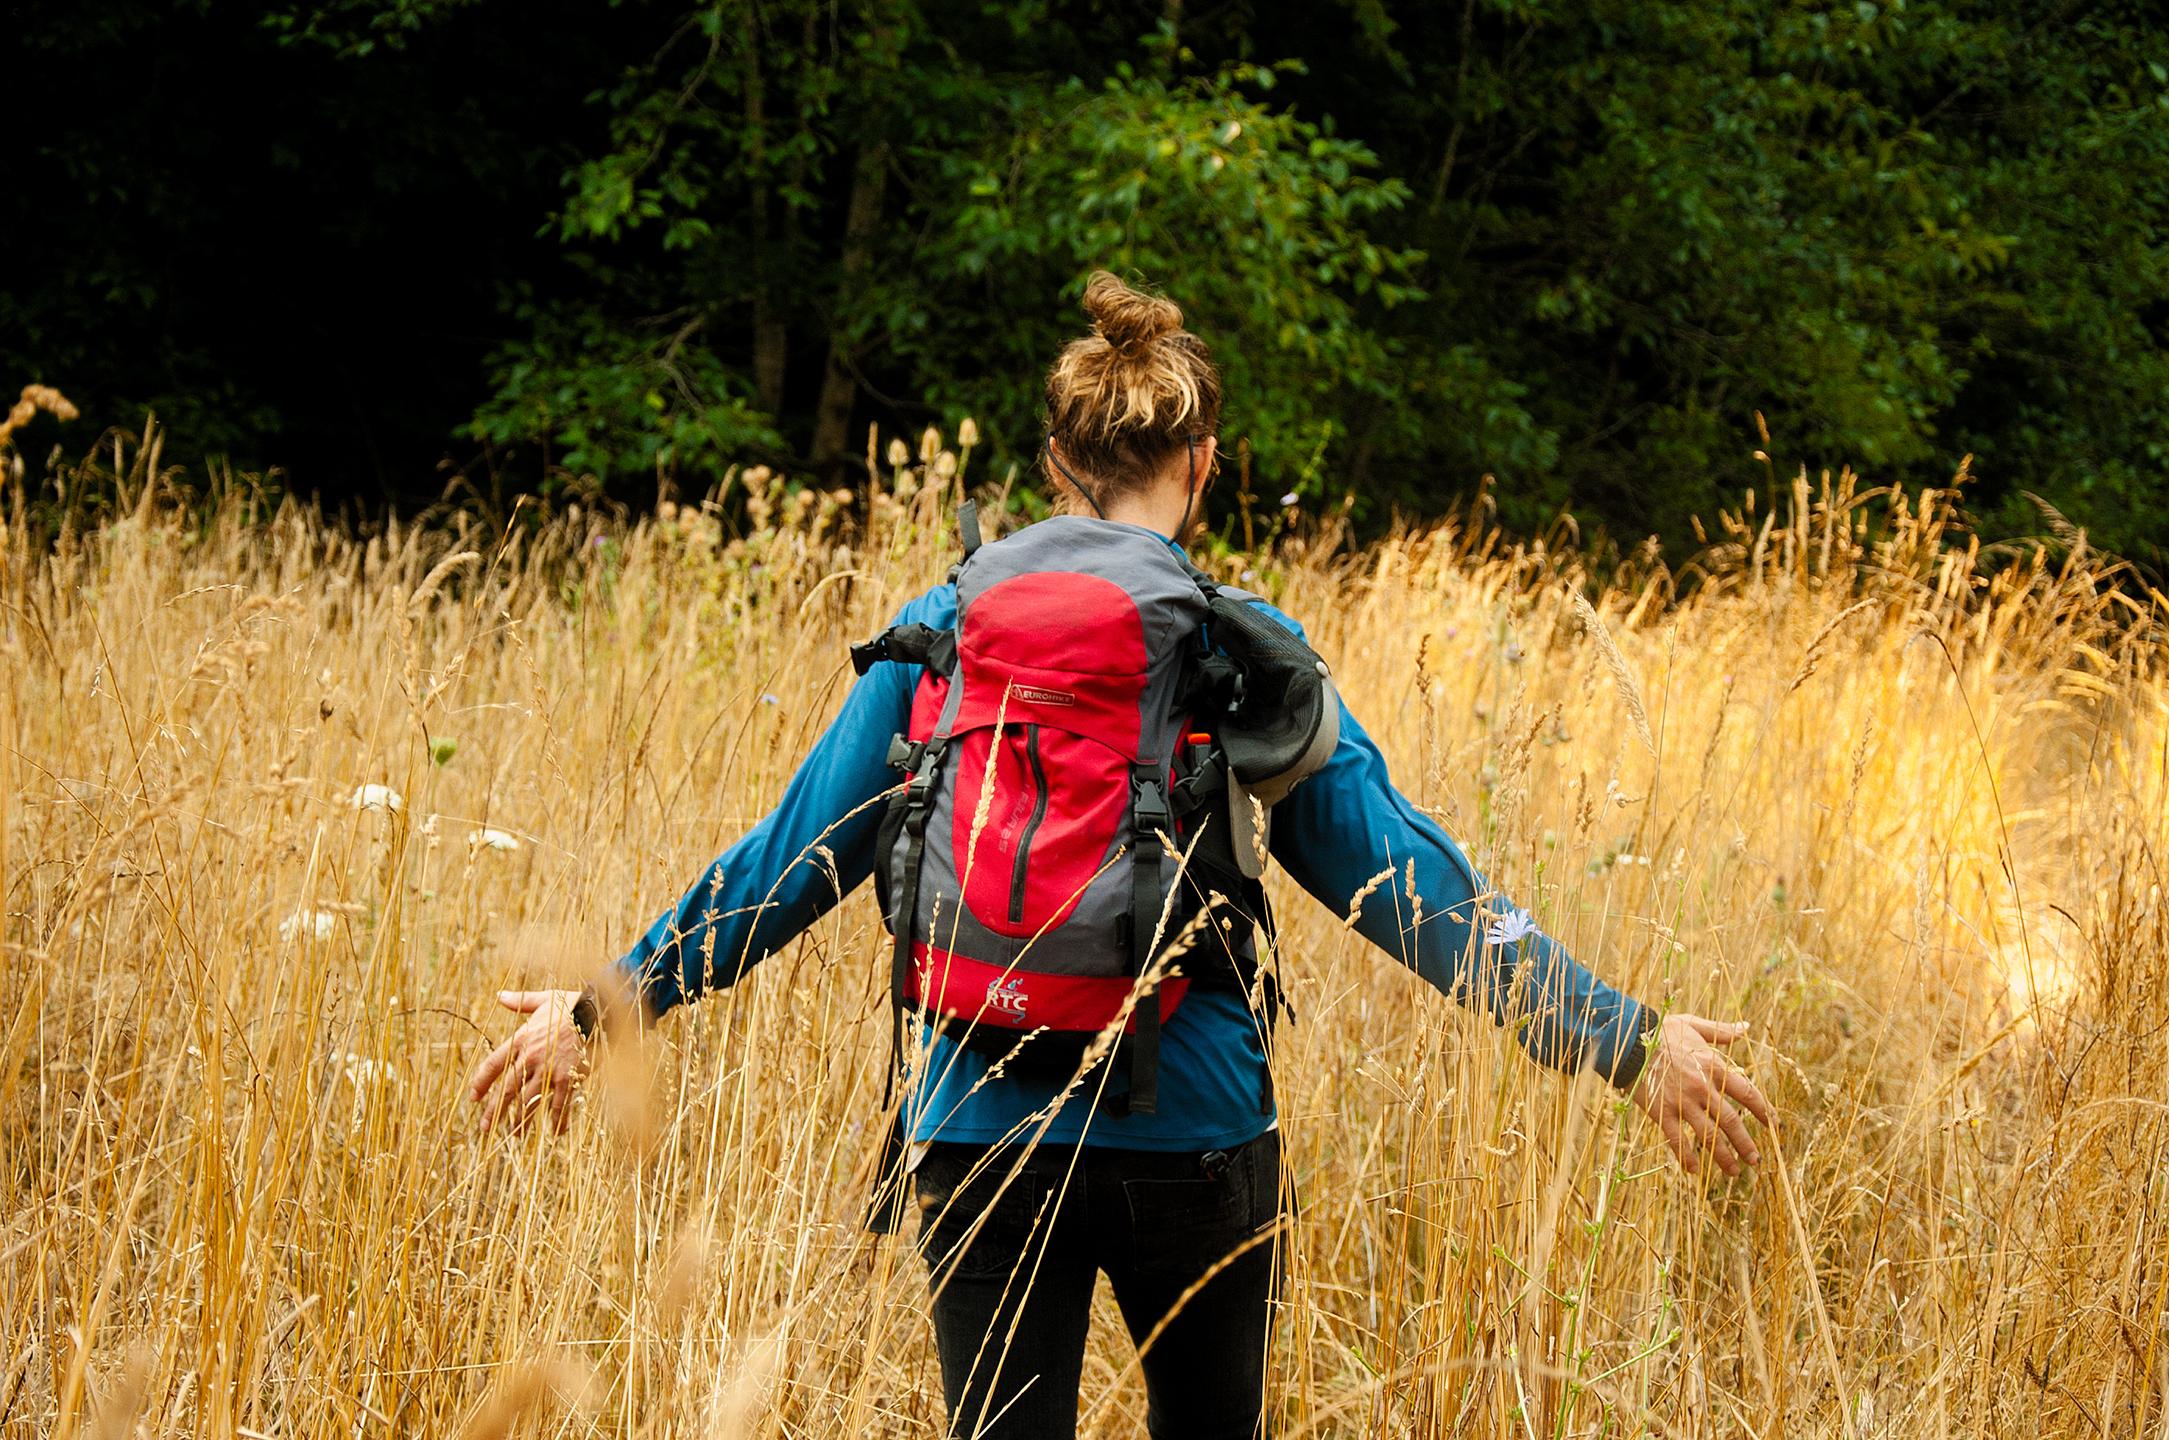 George hiking in Redwood National Park, CA